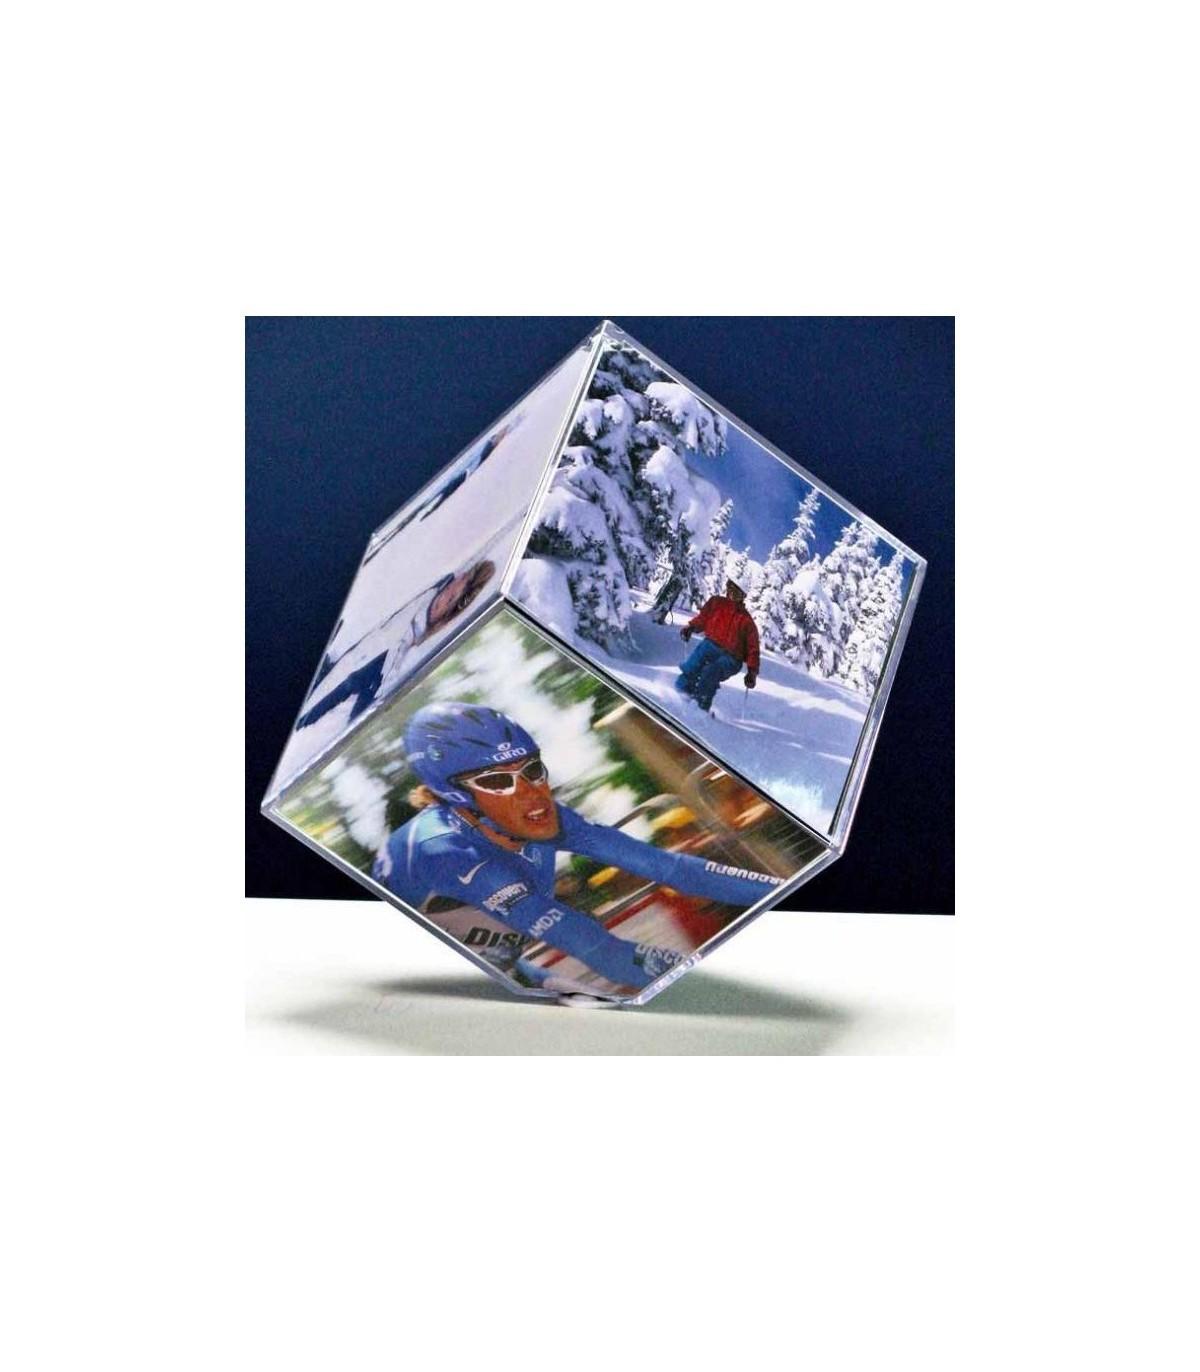 tournicube le cube photos